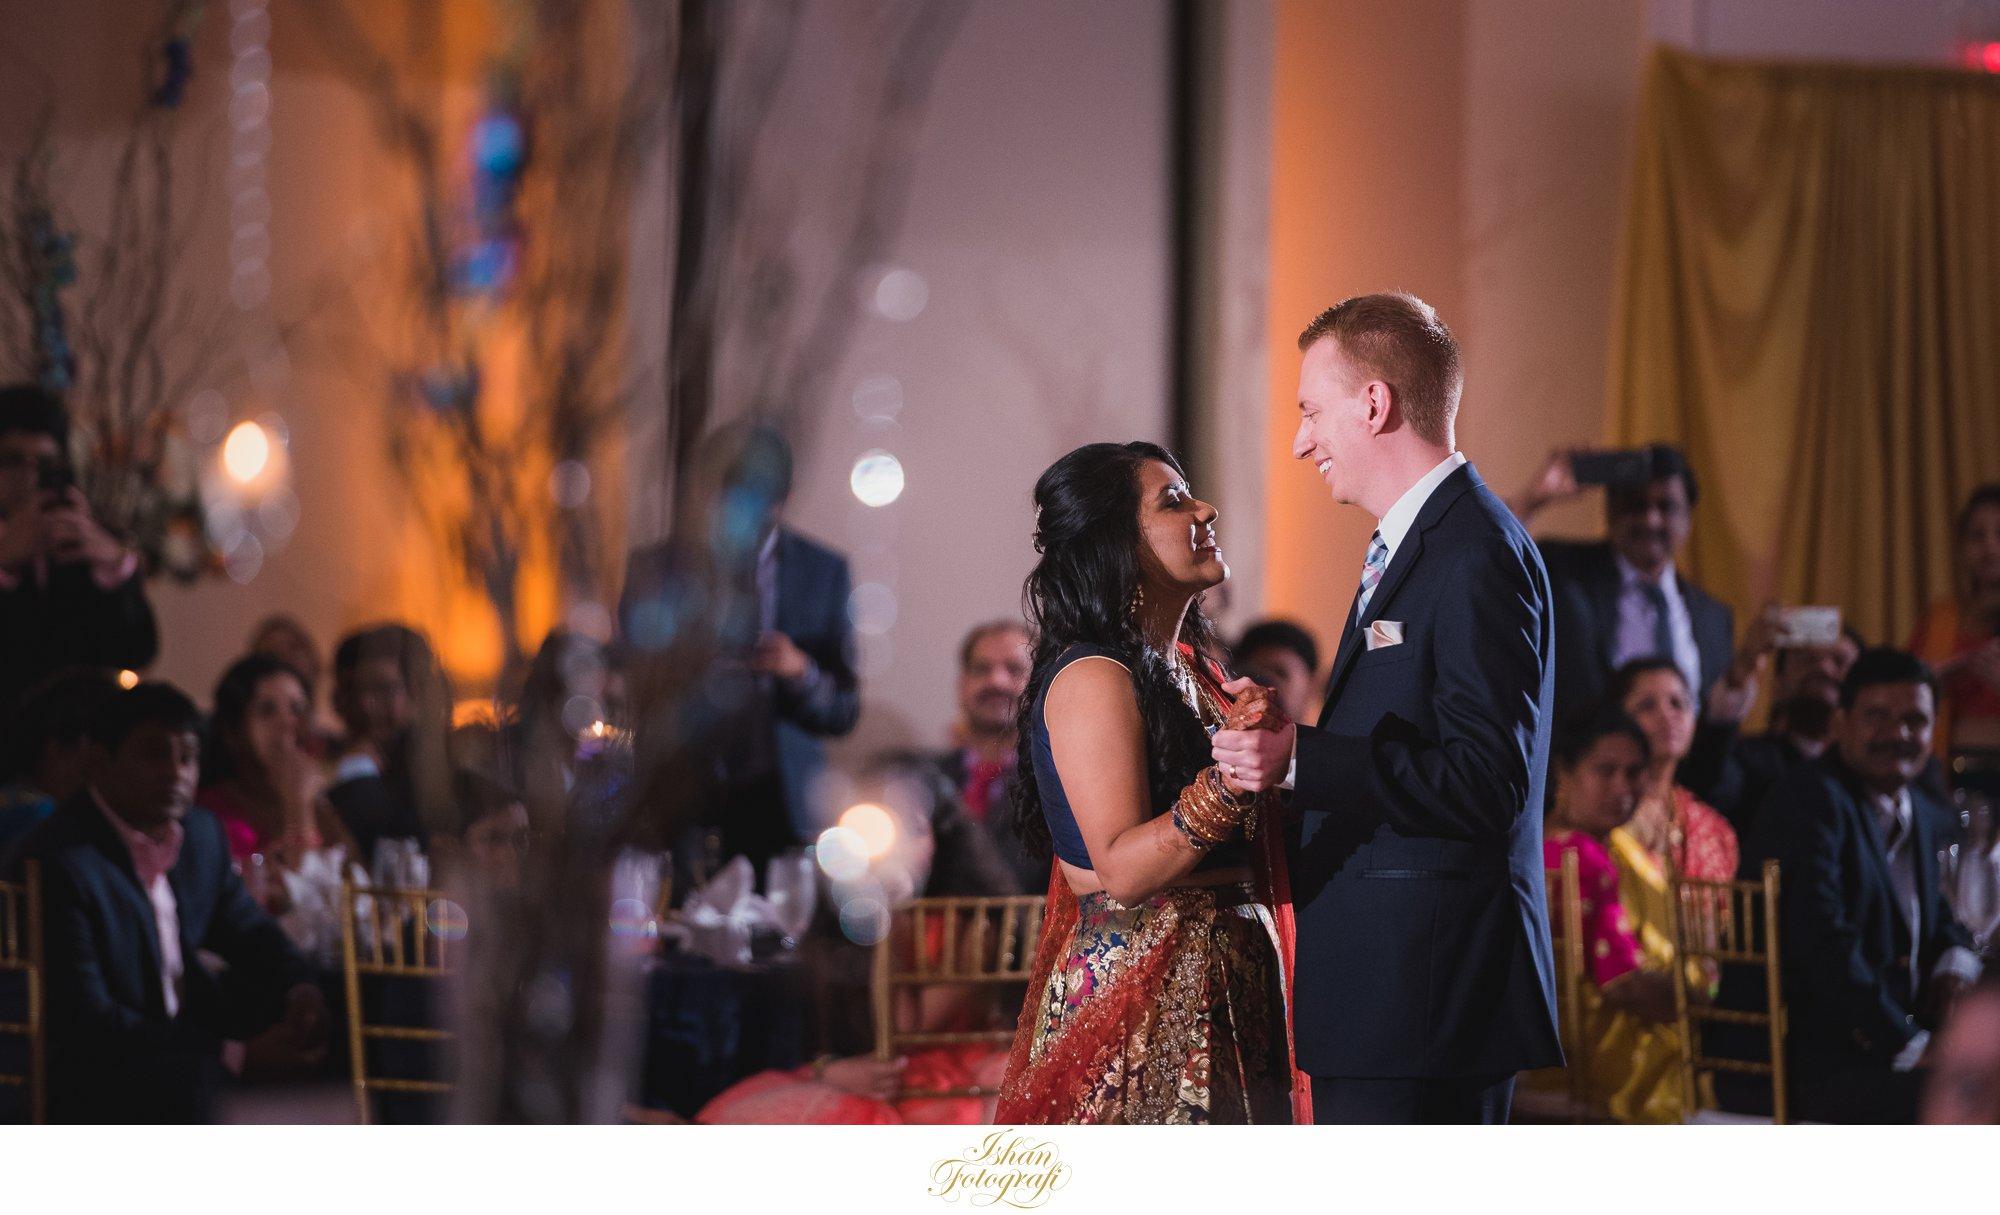 wedding-reception-photos-sheraton-harrisburg-hershey-hotel